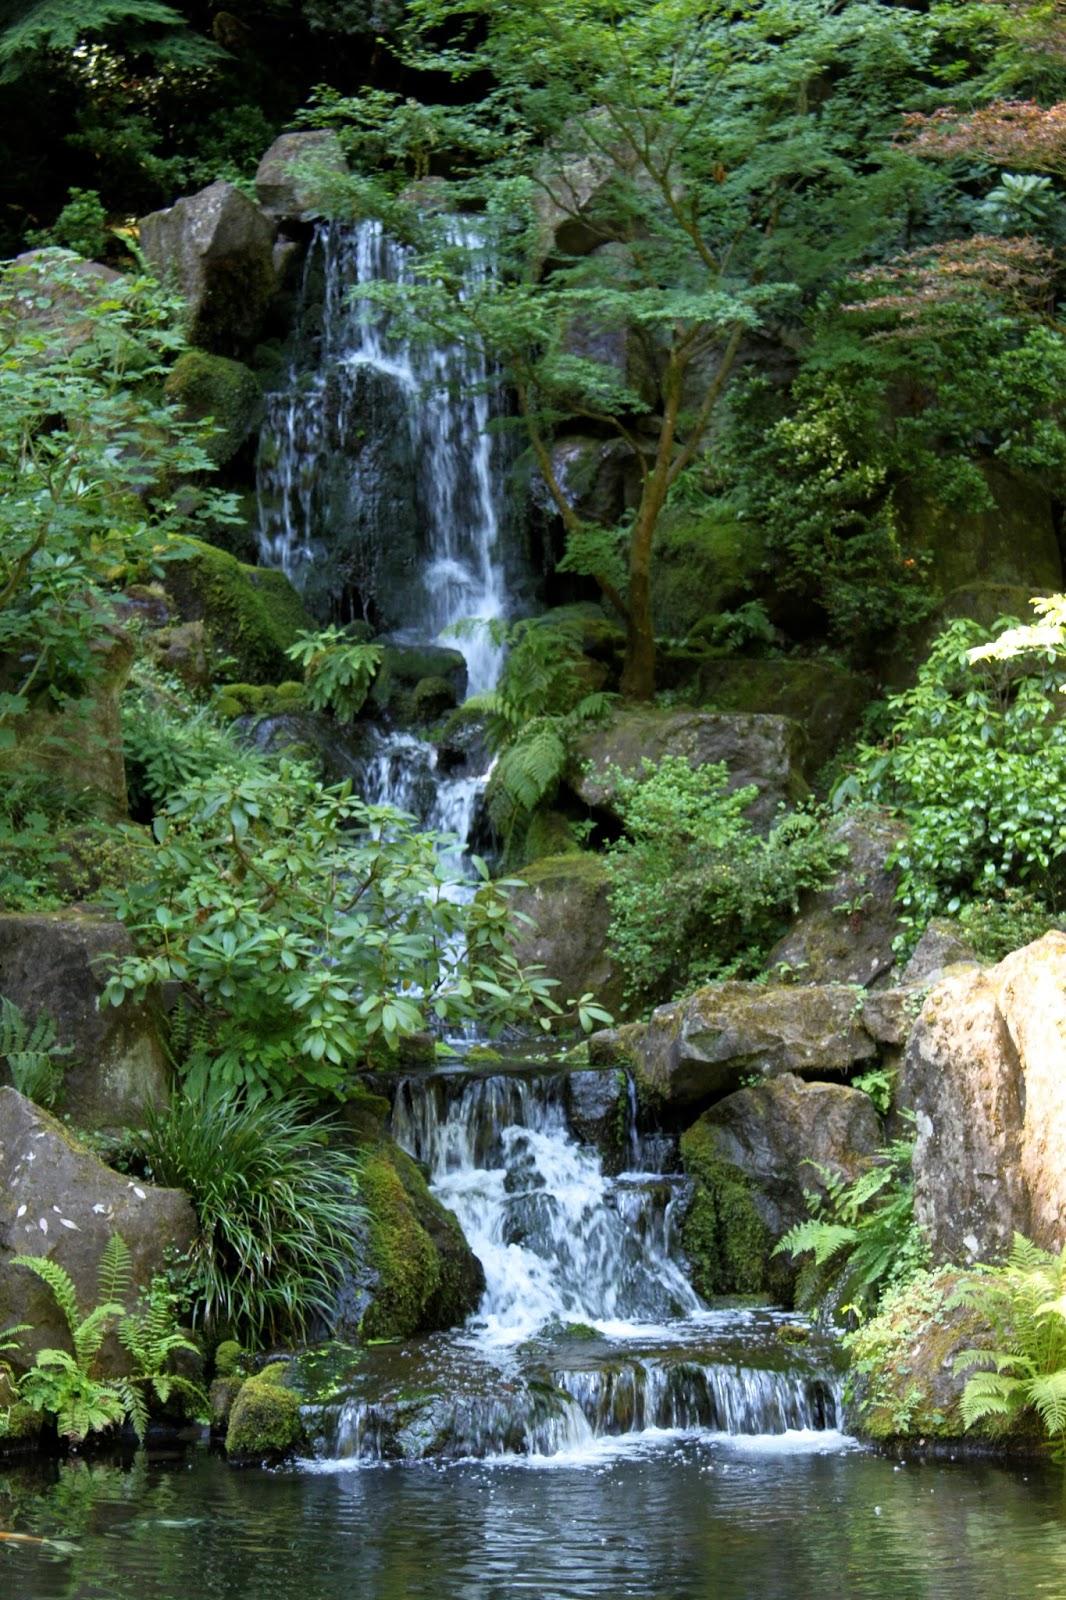 Portland Japanese Garden Store: A Charlotte Garden: Summer Wrap-Up: Portland, Day 3, Part 1